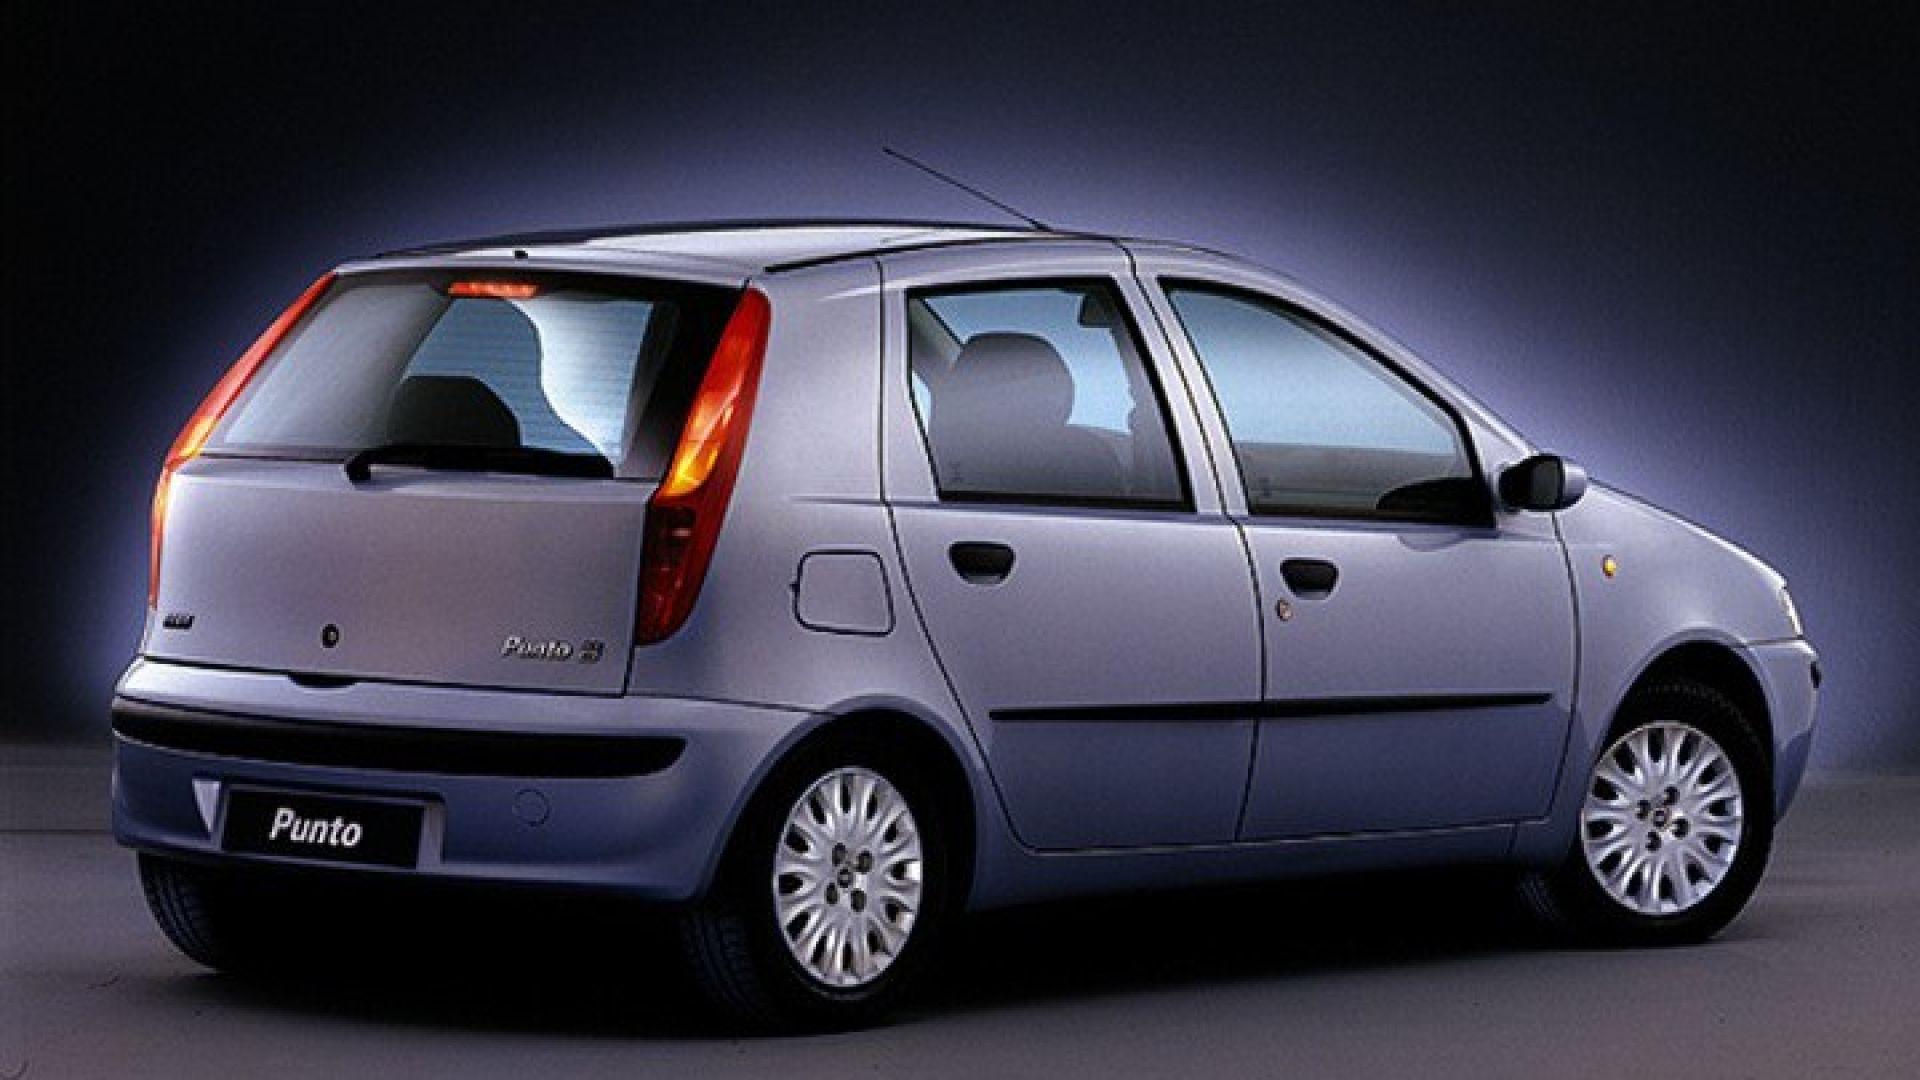 Prova su strada: Fiat Punto my 1999 - MotorBox on fiat marea, fiat stilo, fiat ritmo, fiat linea, fiat 500l, fiat doblo, fiat cinquecento, fiat coupe, fiat spider, fiat panda, fiat barchetta, fiat bravo, fiat cars, fiat multipla, fiat 500 turbo, fiat x1/9, fiat 500 abarth, fiat seicento,